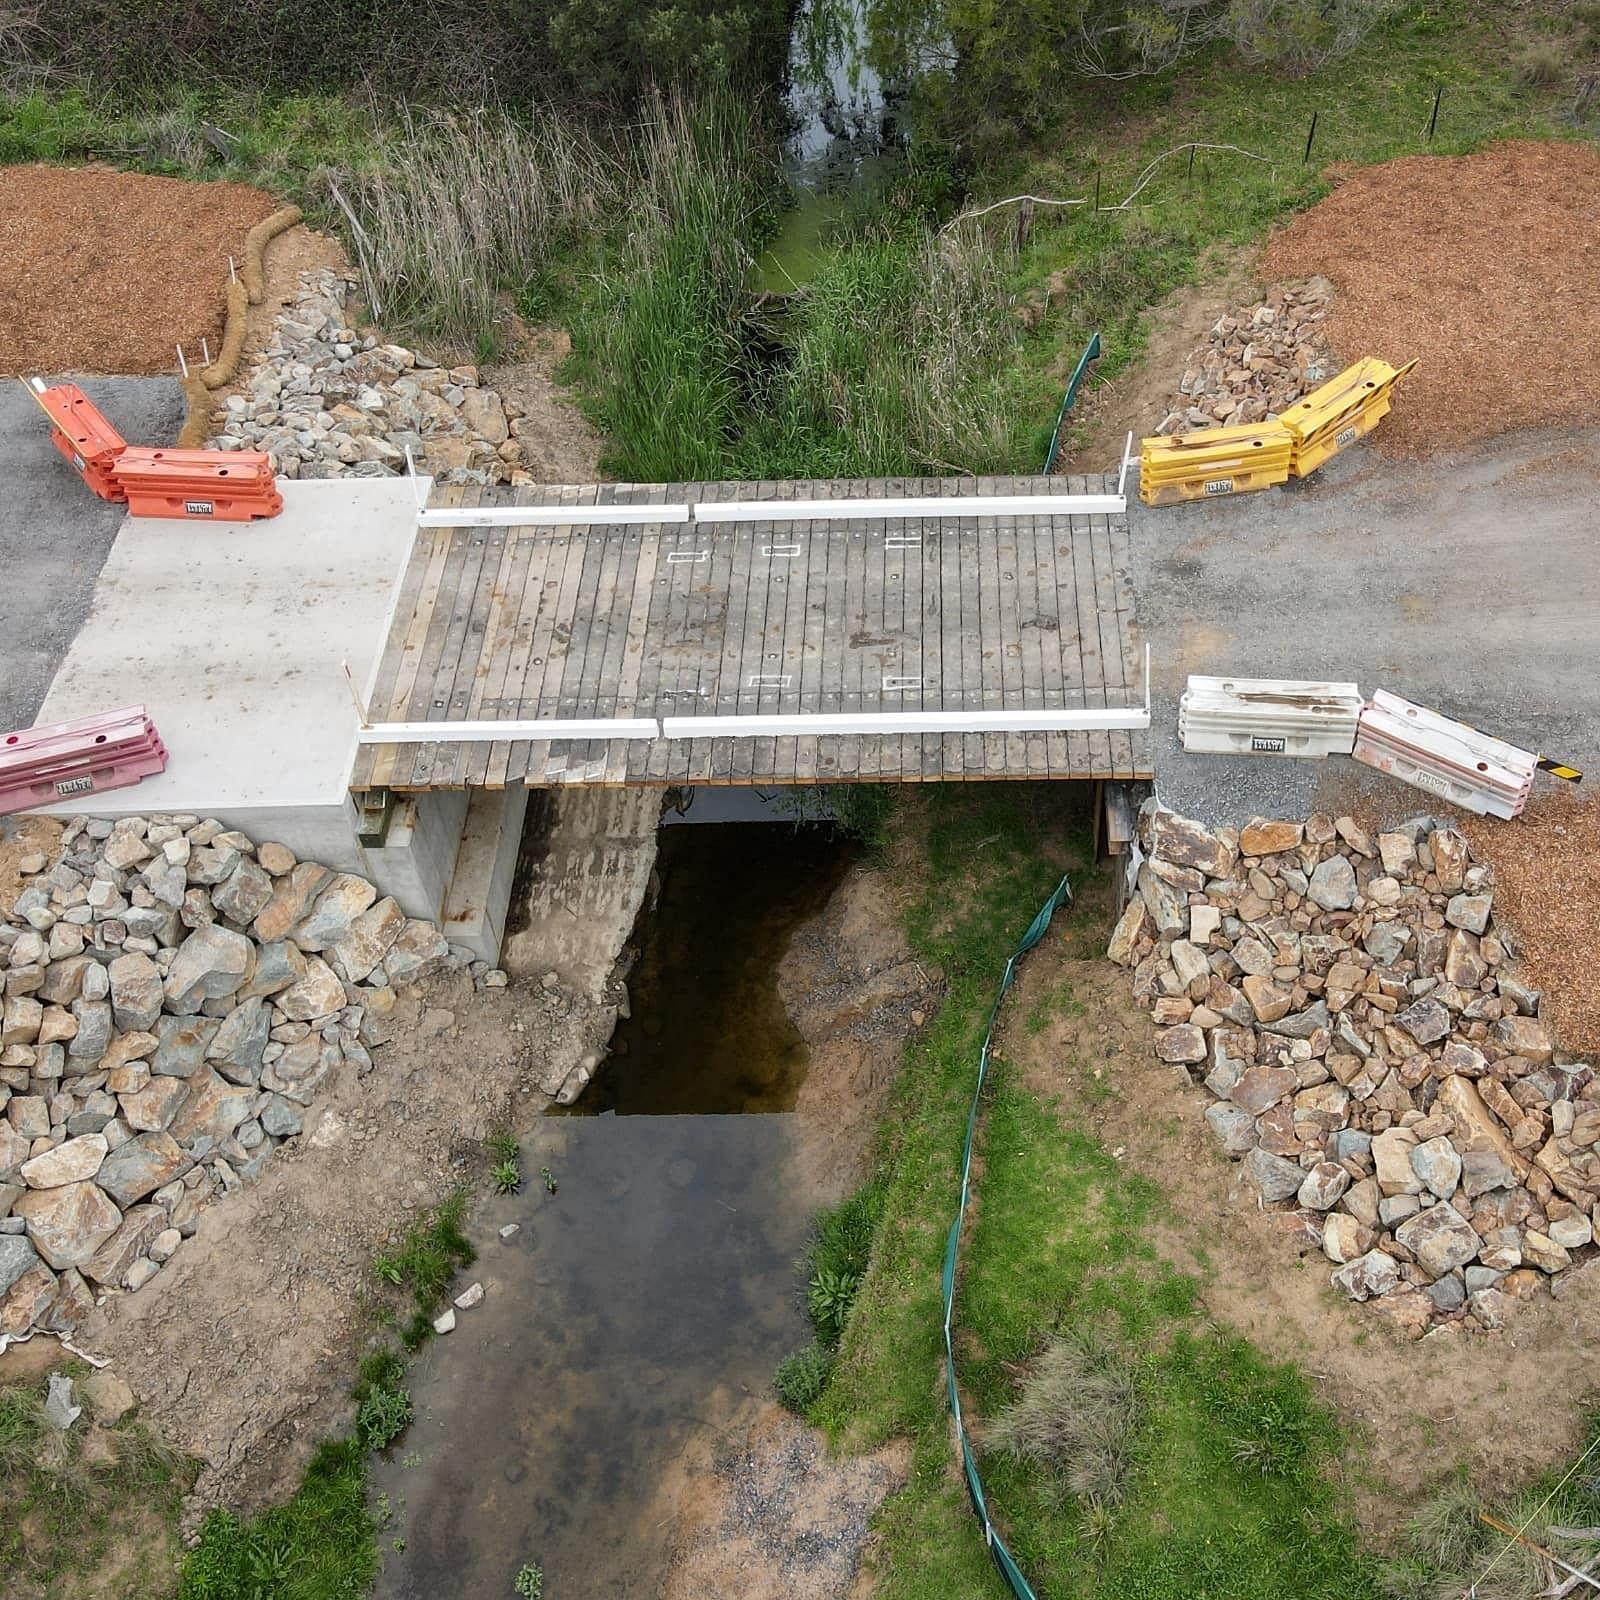 Slaters Lane bridge reopened